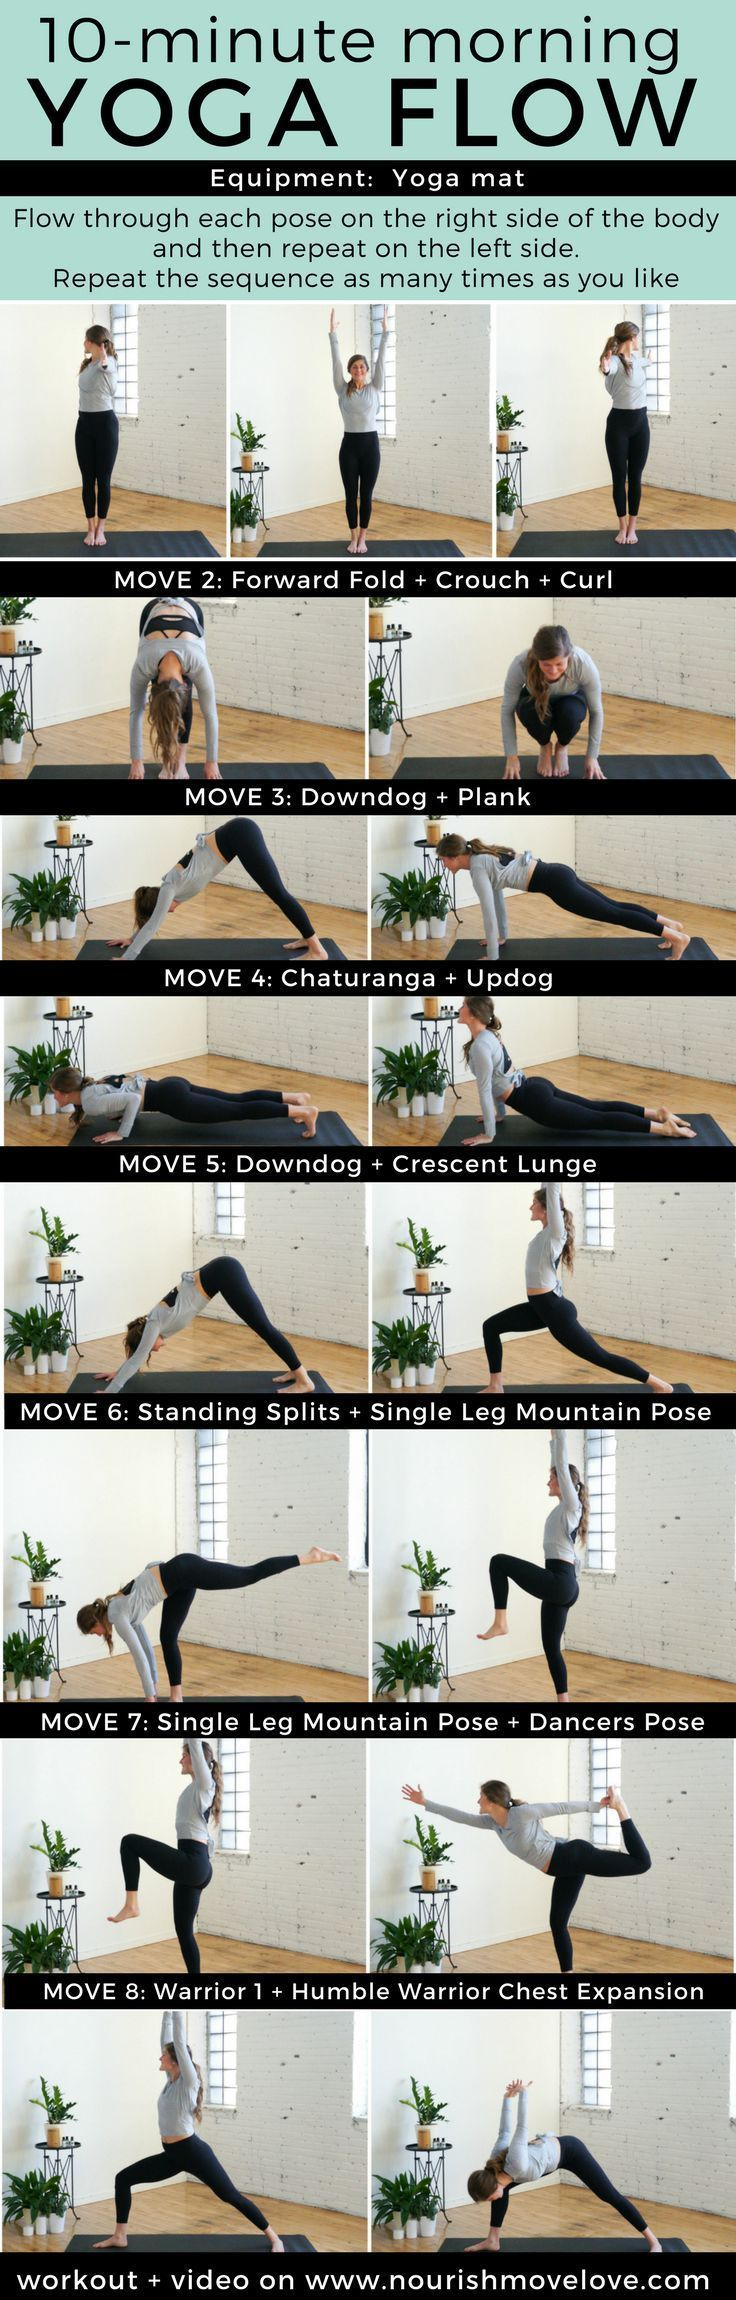 10-Minute Morning Yoga Flow for Beginners   www.nourishmovelove.com #yogaflow #fitness